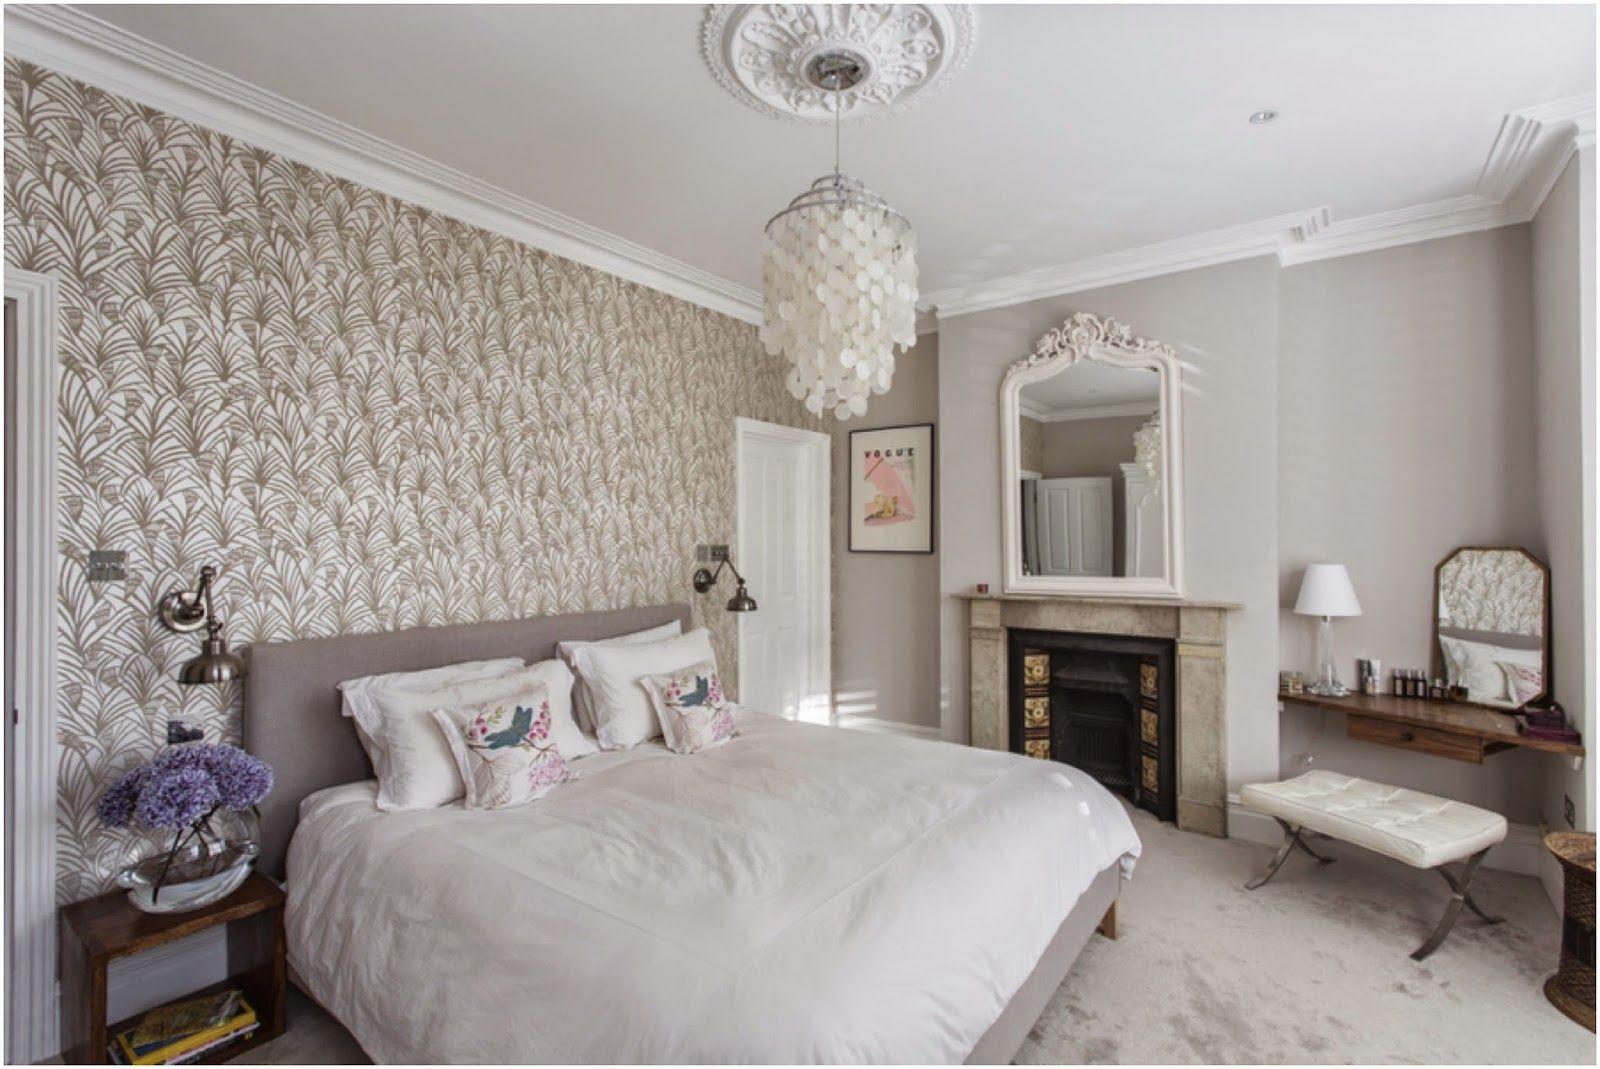 Master Bedroom Wallpaper Bedroom Complete Farrow Ball Cornforth White Walls Tapet Cafe